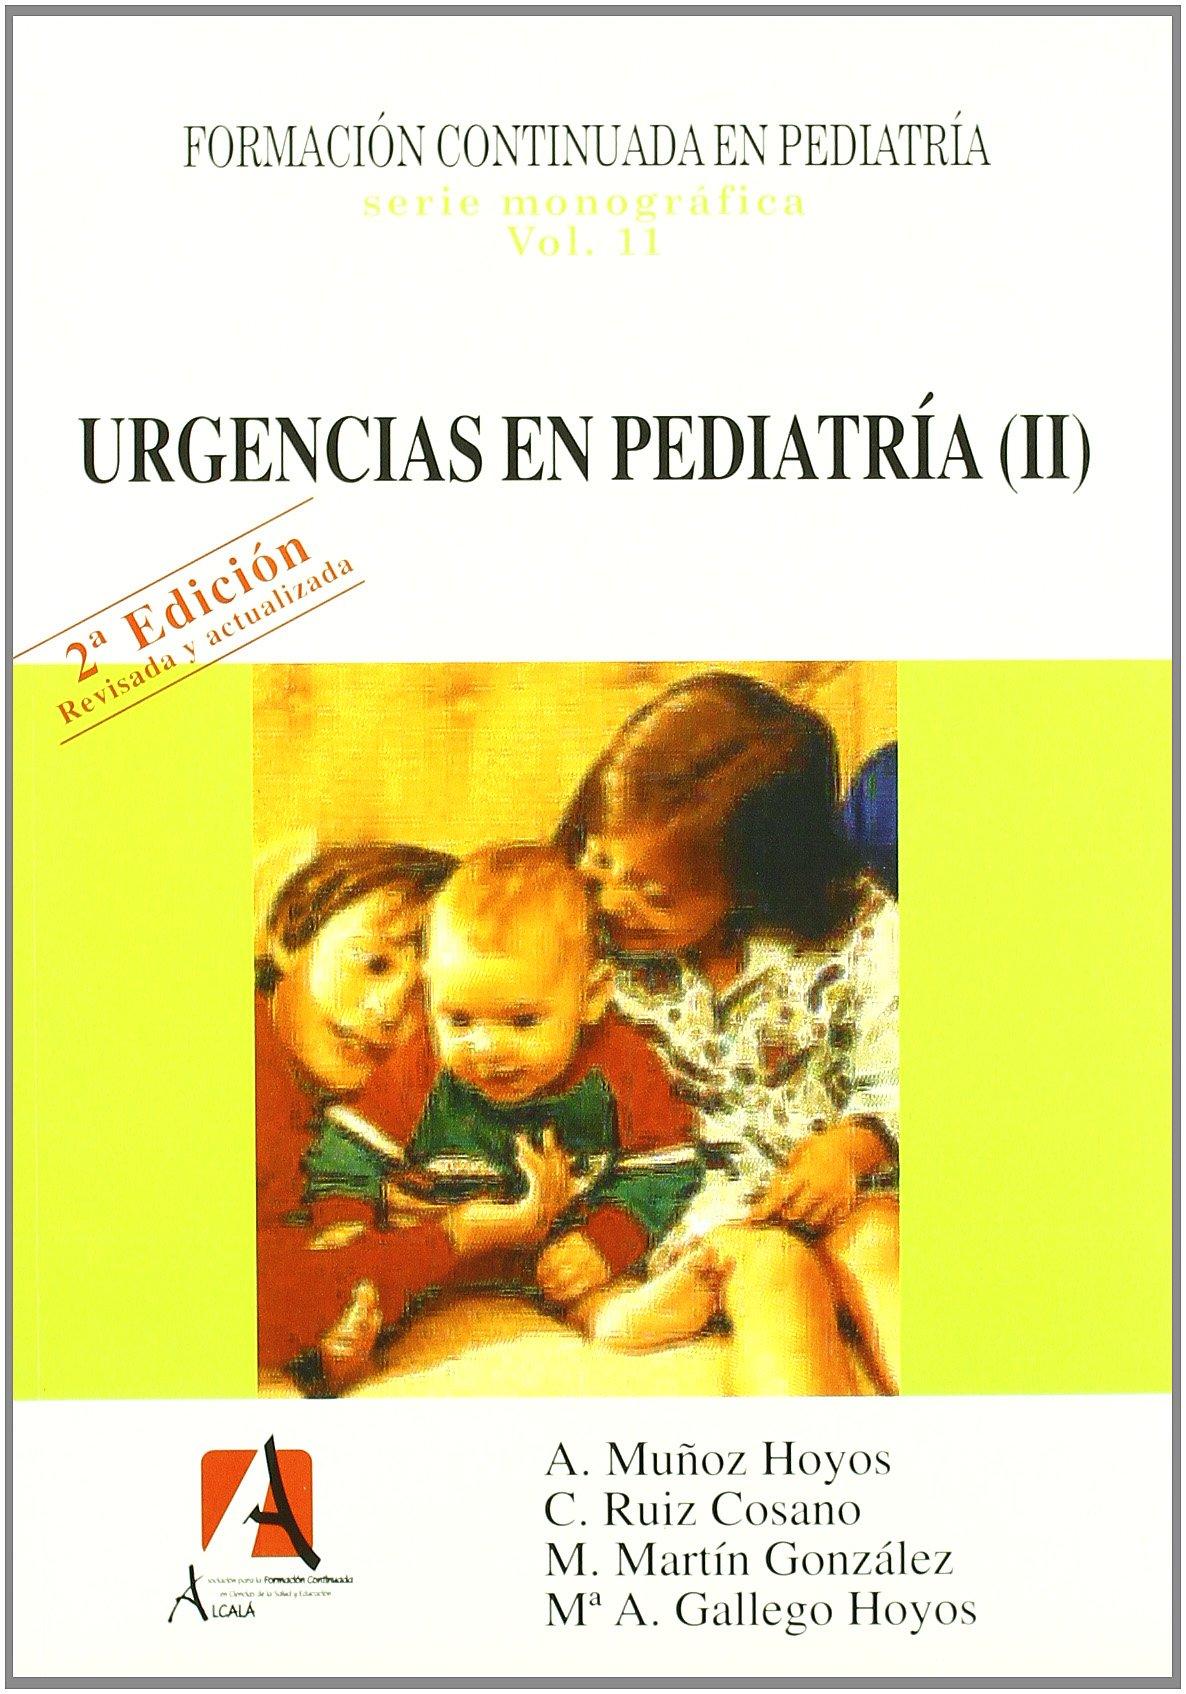 Urgencias en pediatria II / Pediatric emergency (Spanish Edition): Antonio  Munoz Hoyos, C. Ruiz Cosano: 9788495658890: Amazon.com: Books